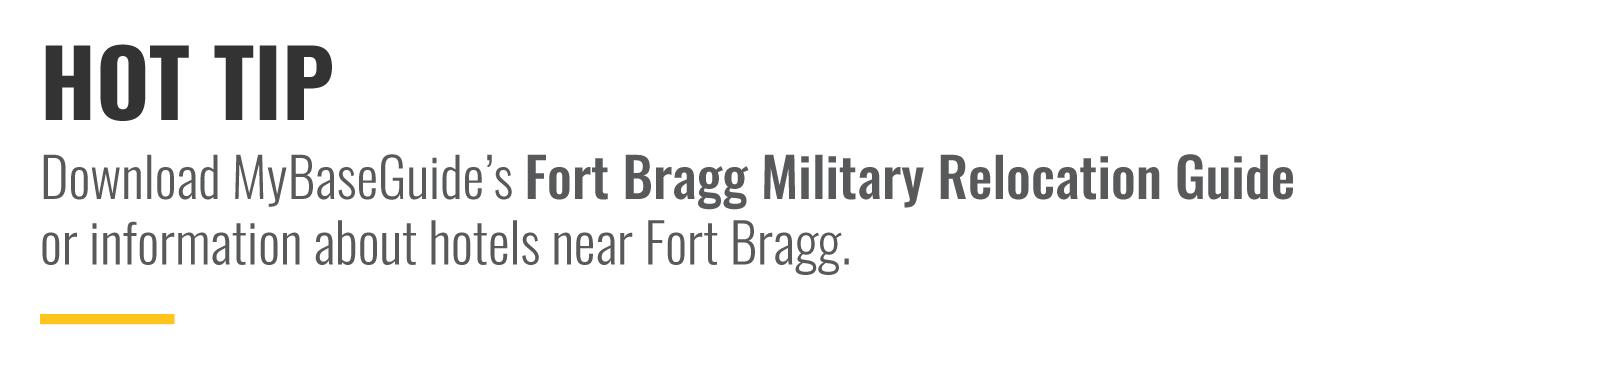 Fort Bragg NC Hot Tip